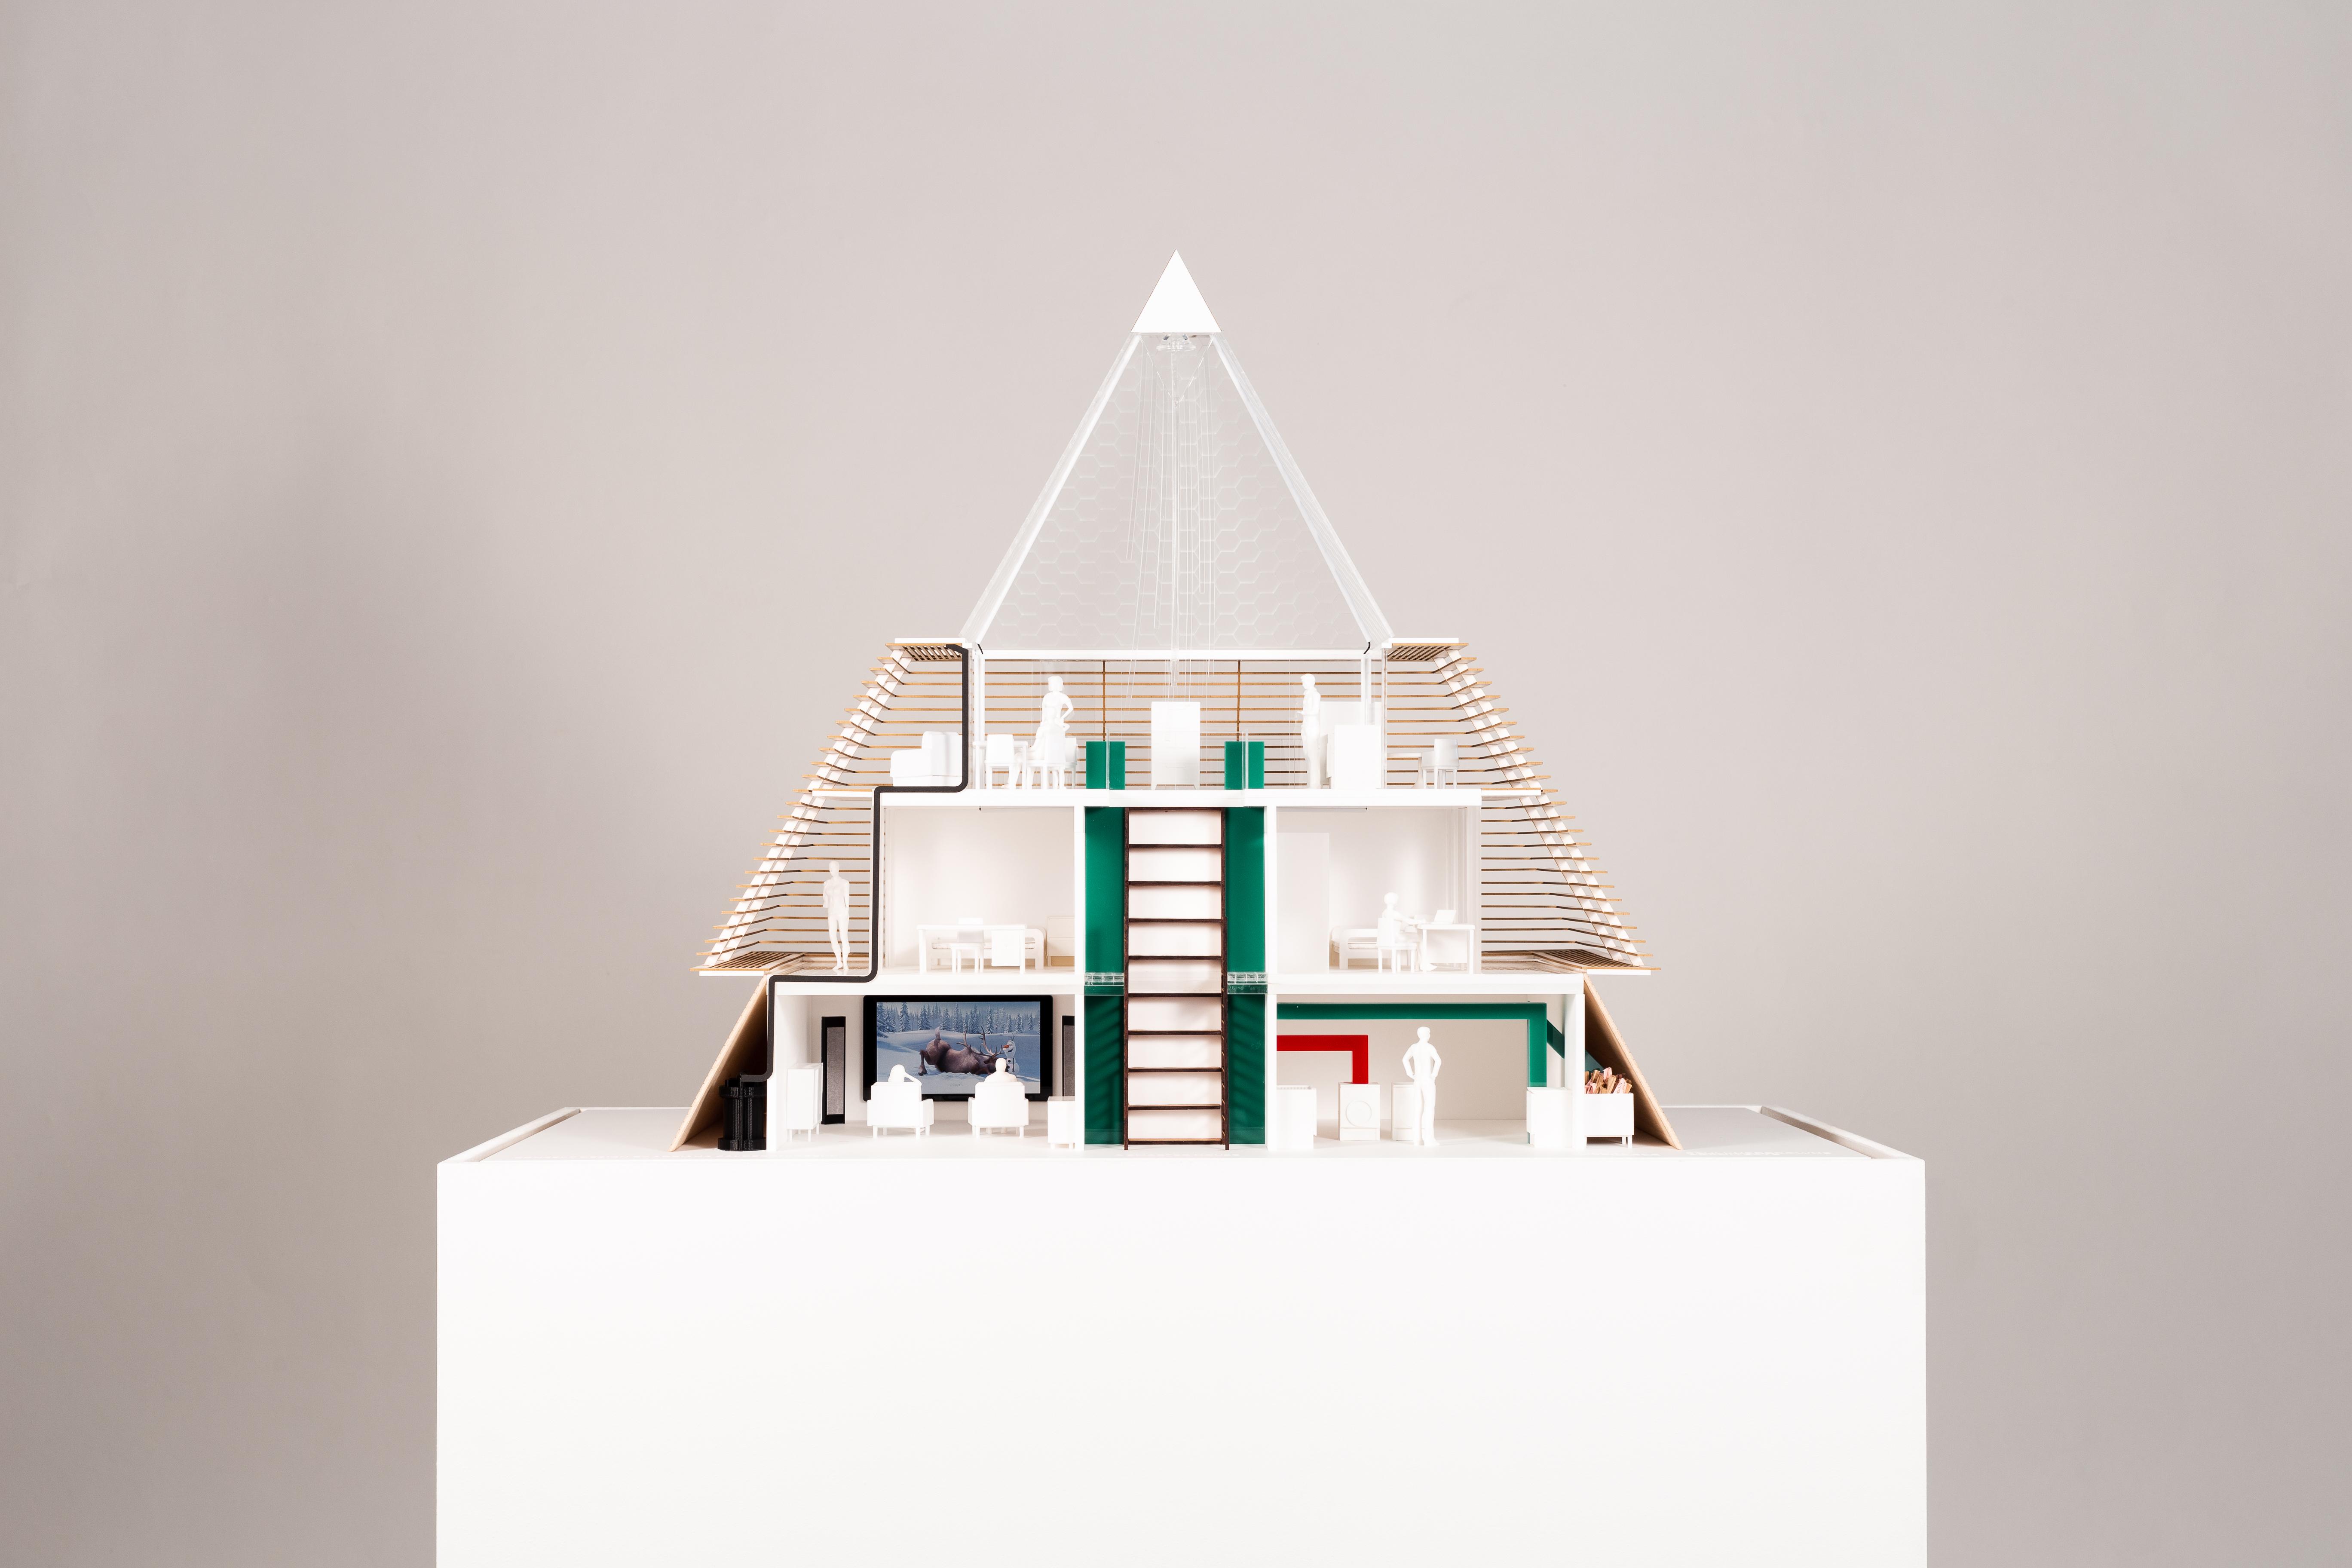 A Smarter House : Little Inventors